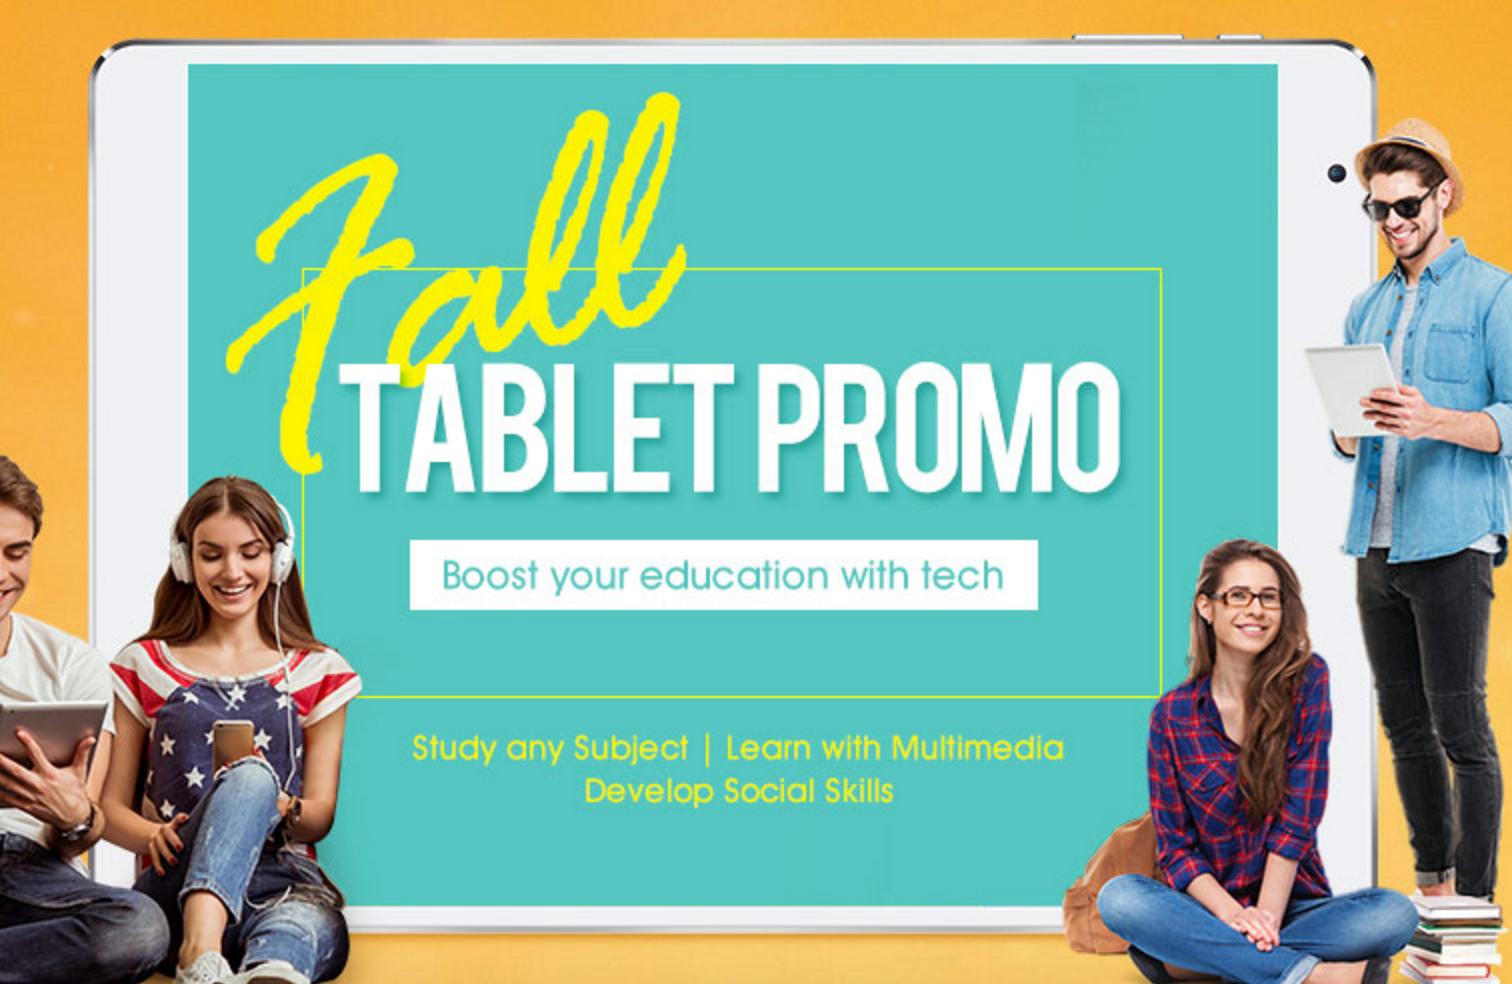 gearbest-tablet-promo-2016-sep